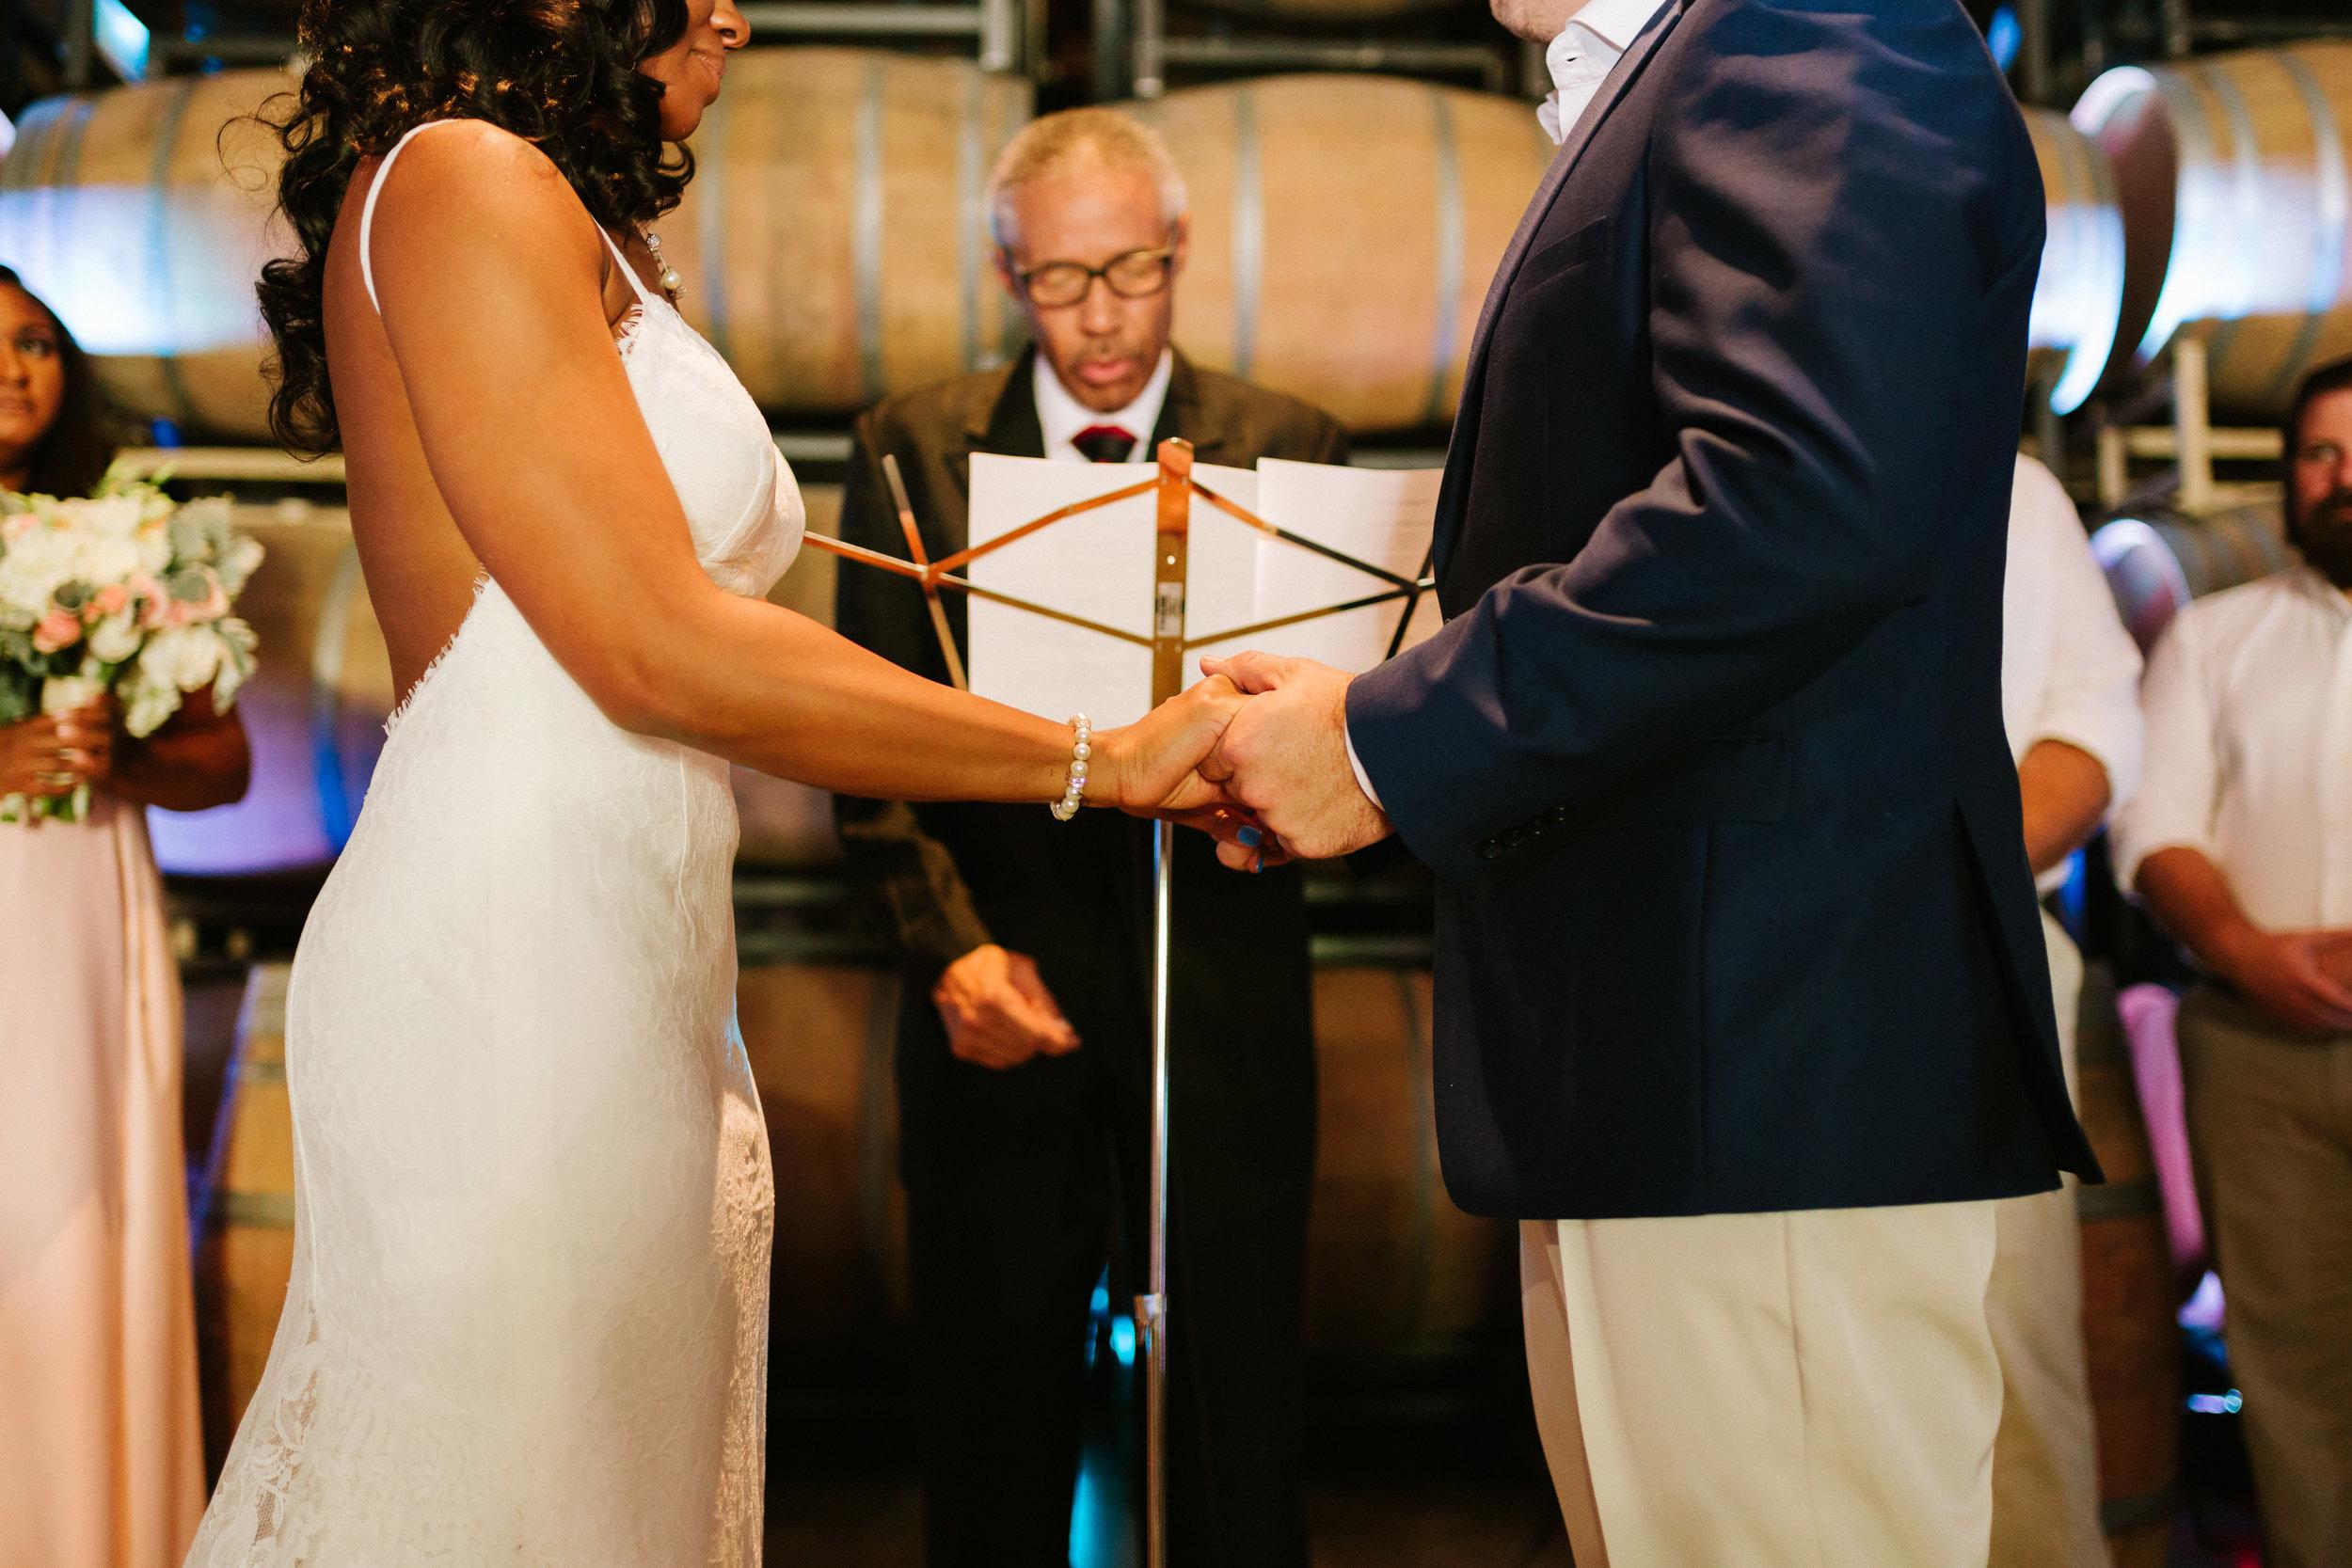 2017.09.16 Ashley and Chuck O'Day Quantam Leap Winery Wedding (174 of 462).jpg